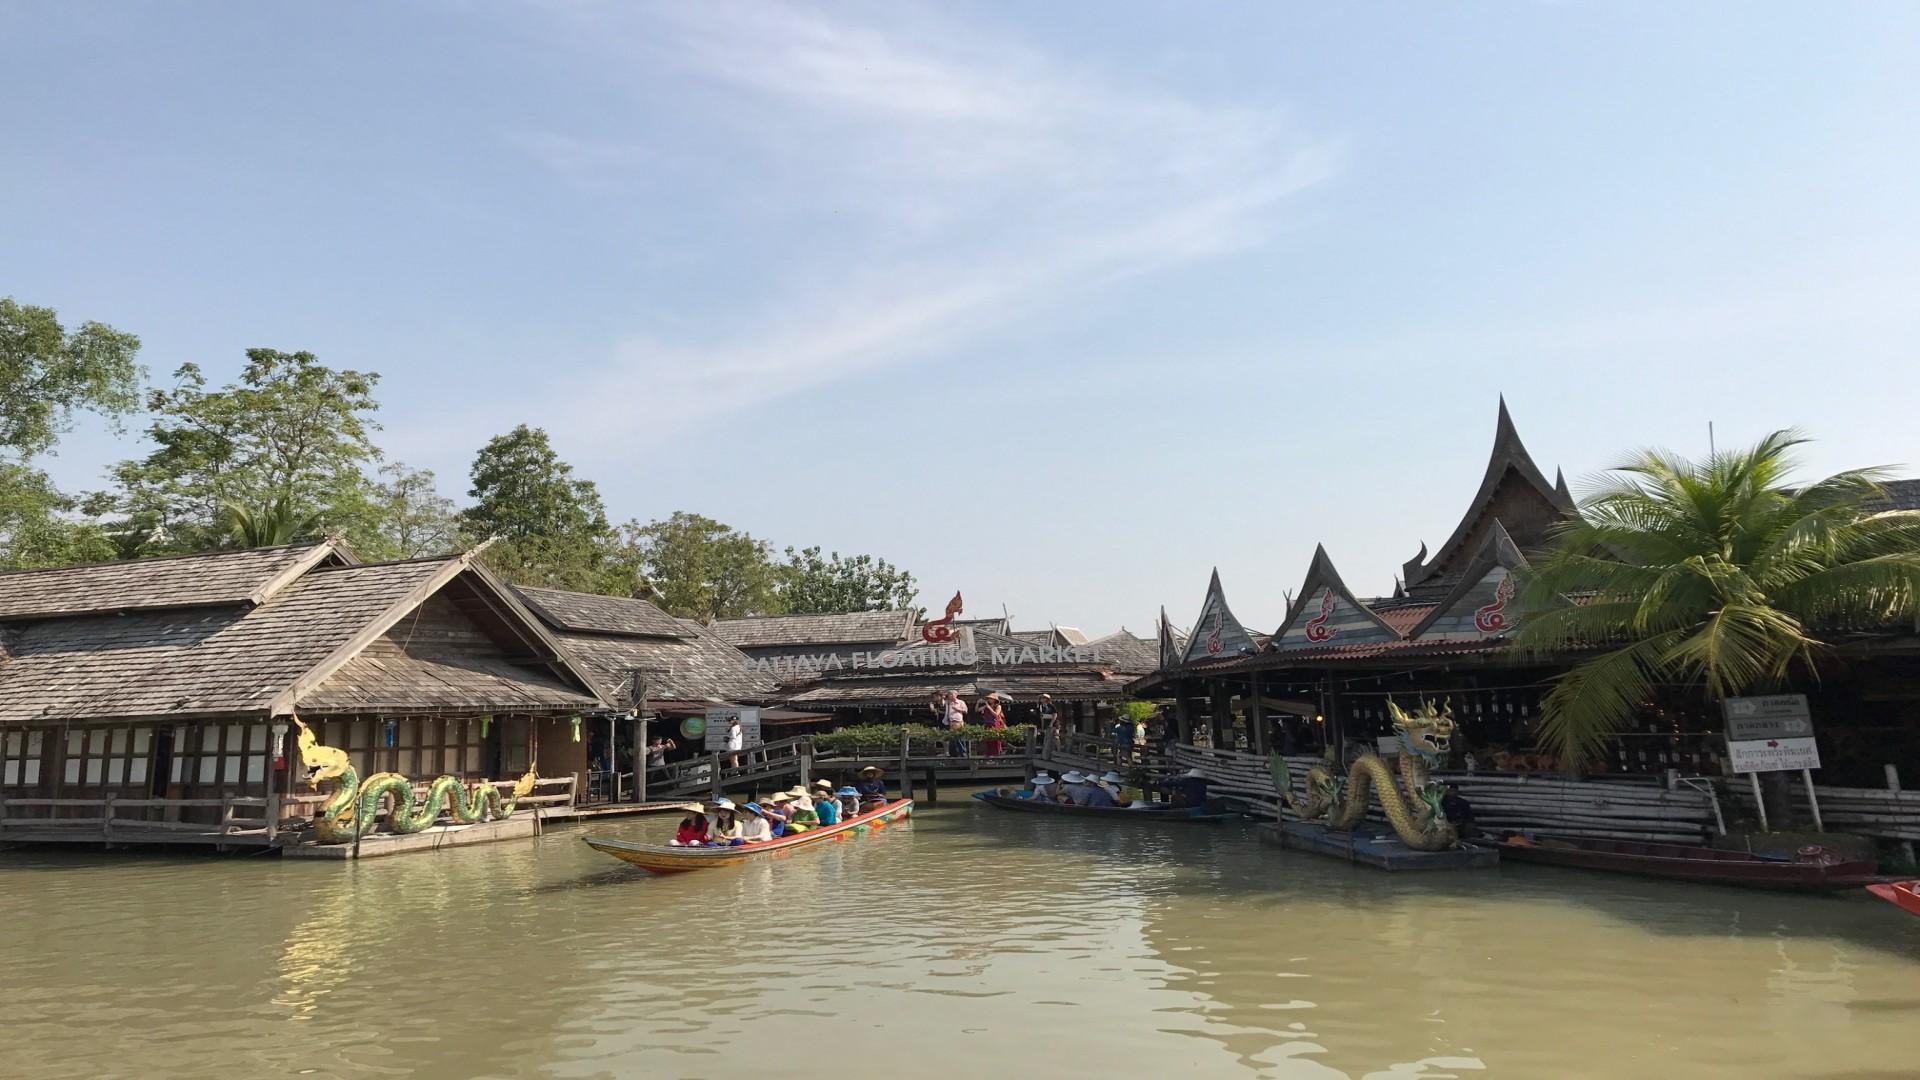 THAILAND - ORDINARY AND SIMPLE BEAUTY OF THE LIFE (BANGKOK - PATTAYA)